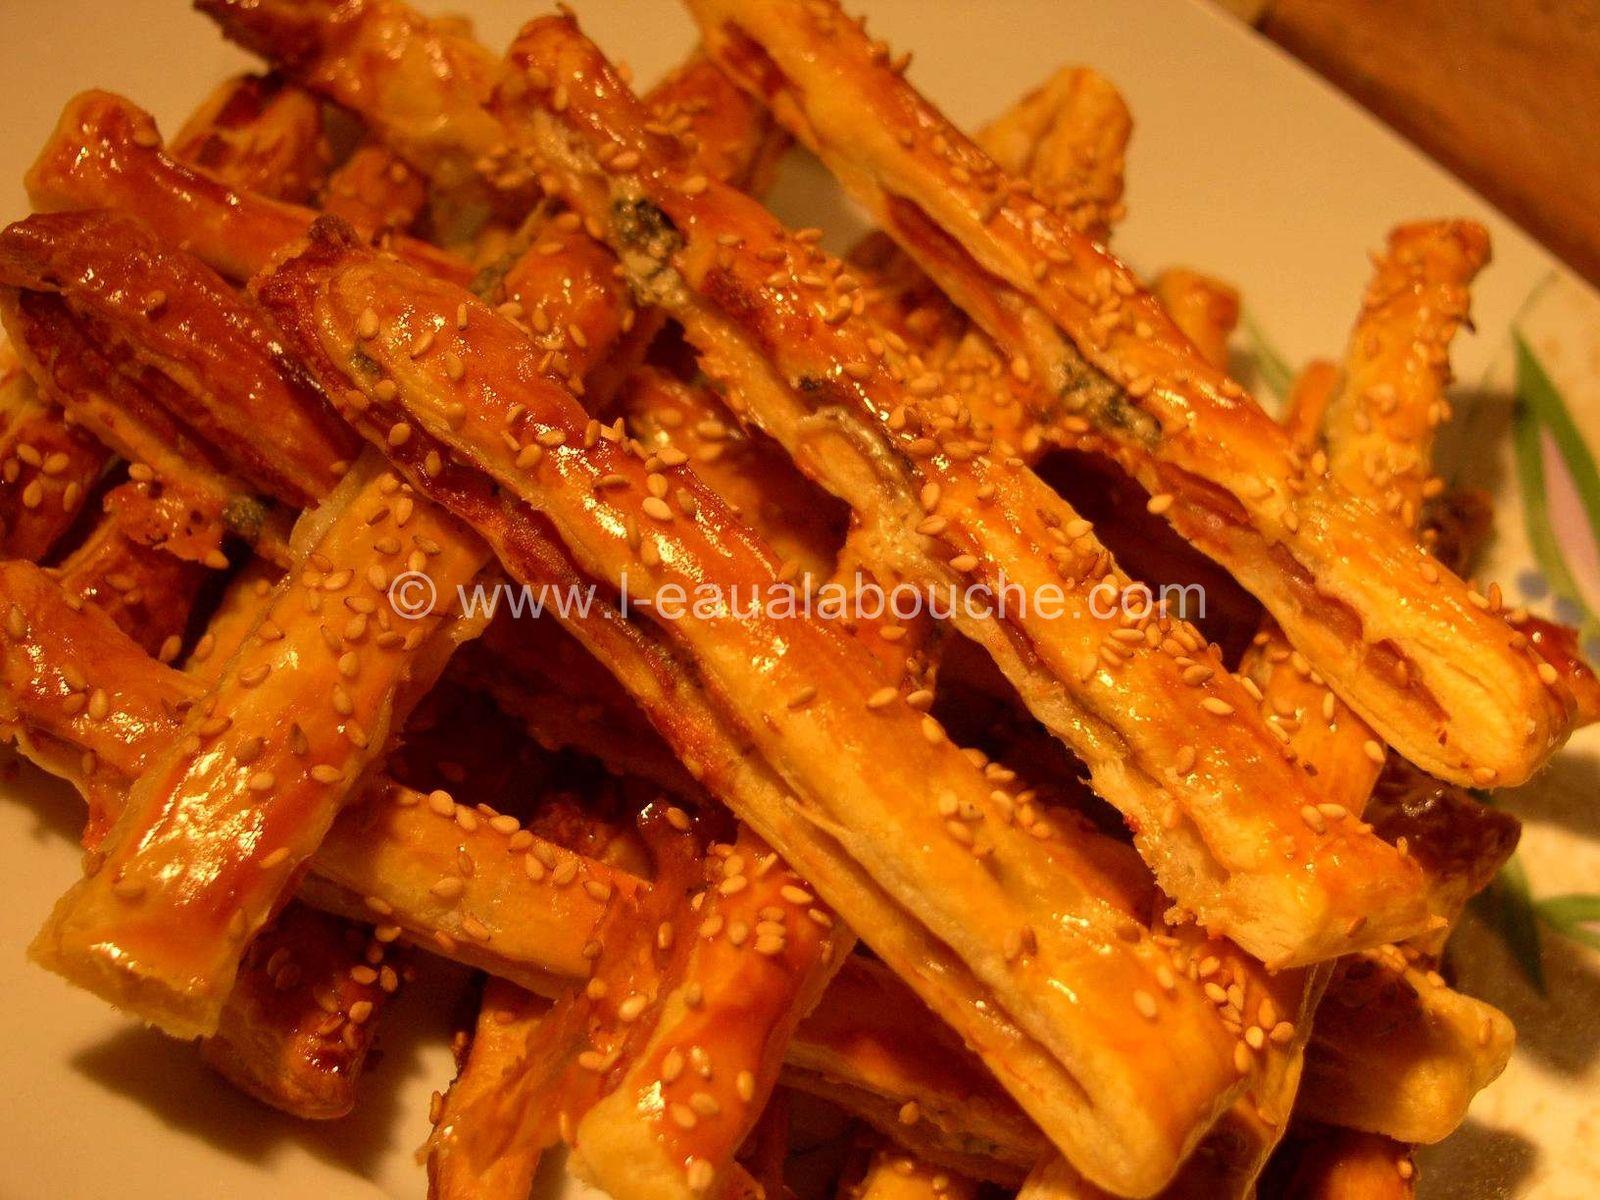 Flûtes au Jambon Cru et au Roquefort